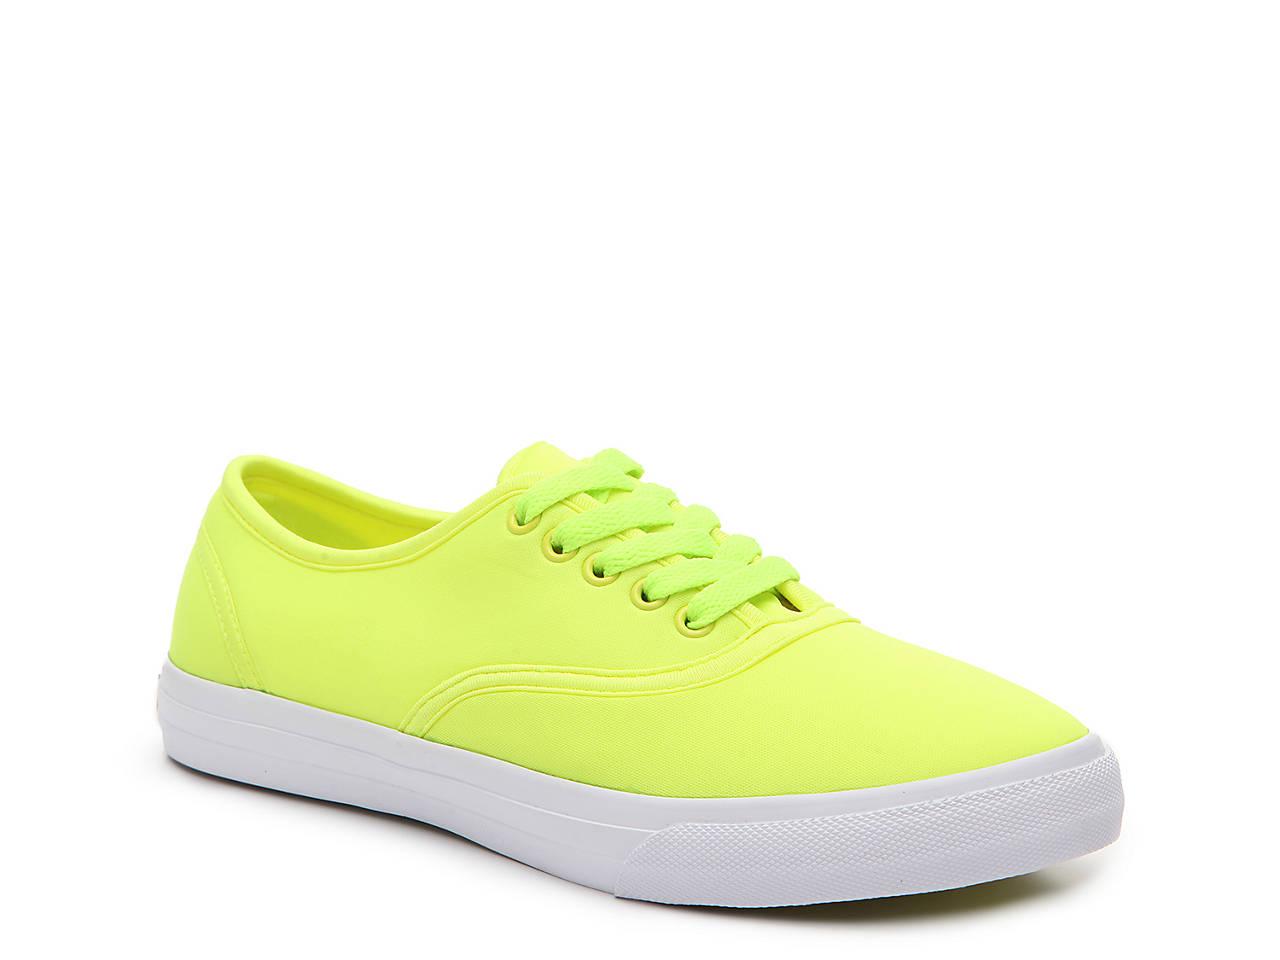 32231a27d5f8 Body Glove Fiji Sneaker Women s Shoes